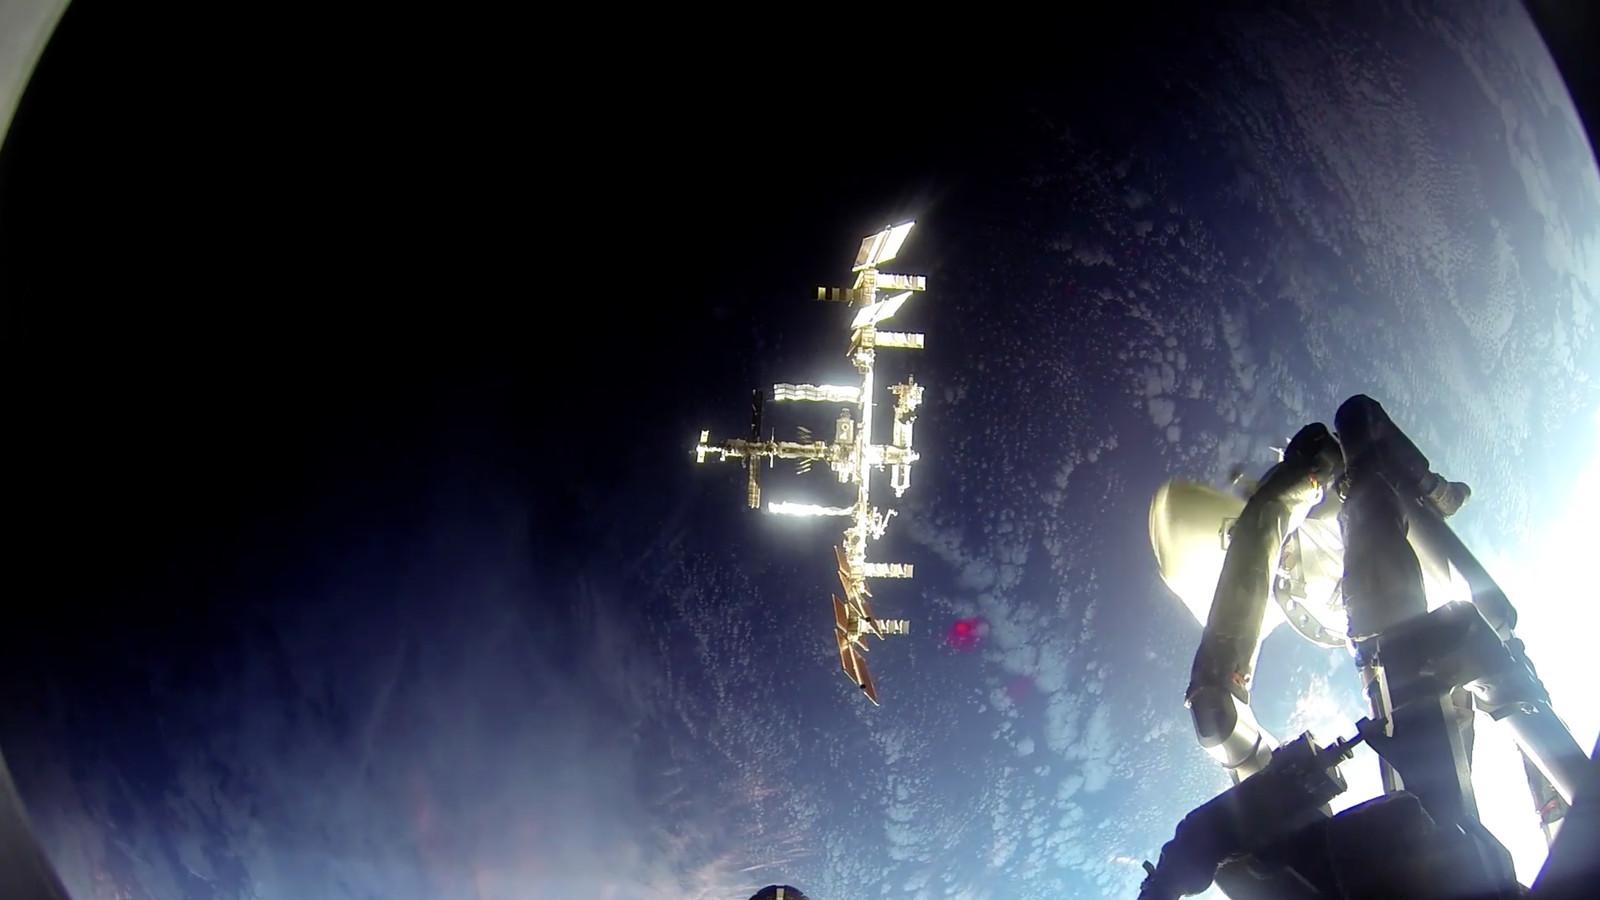 astronaut iphone dock - photo #14